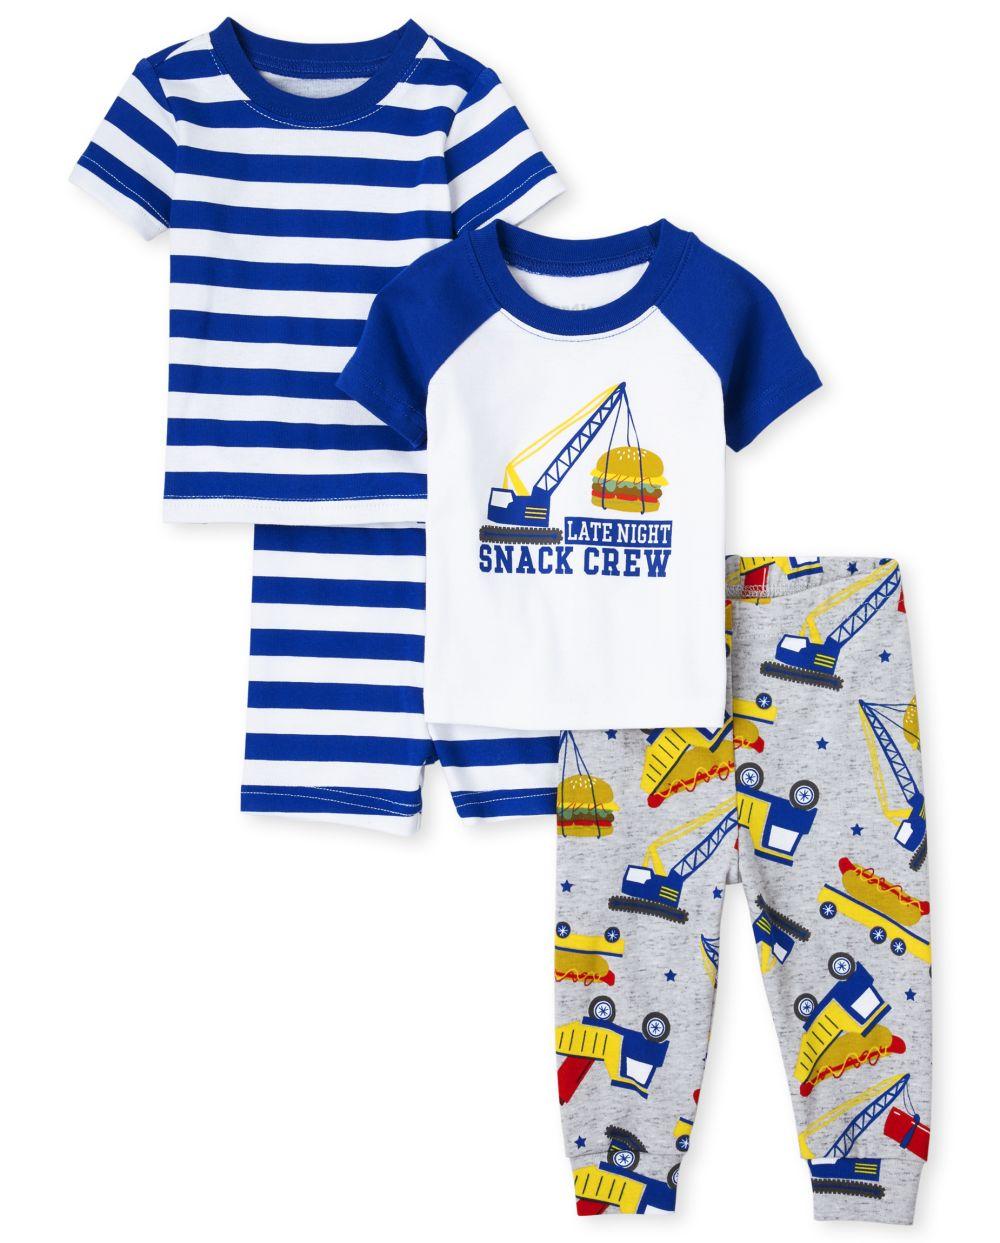 Baby And Toddler Boys Snack Crew Snug Fit Cotton 4-Piece Pajamas